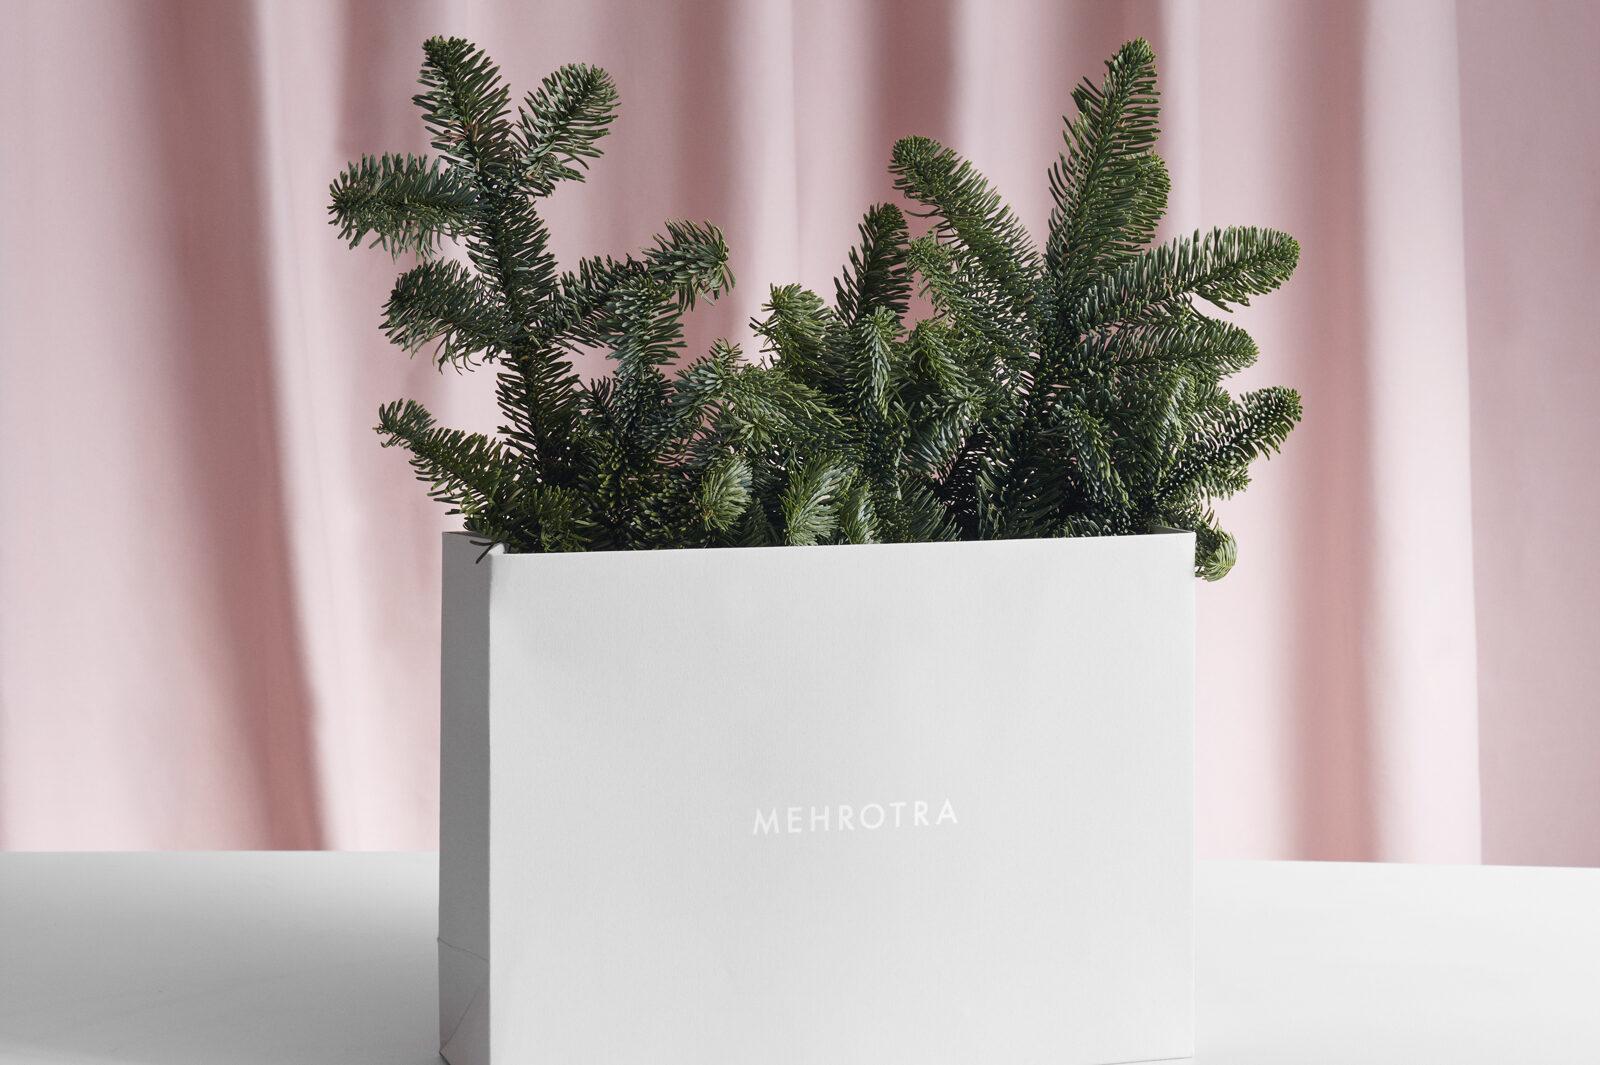 mehrotra-inspiration-image